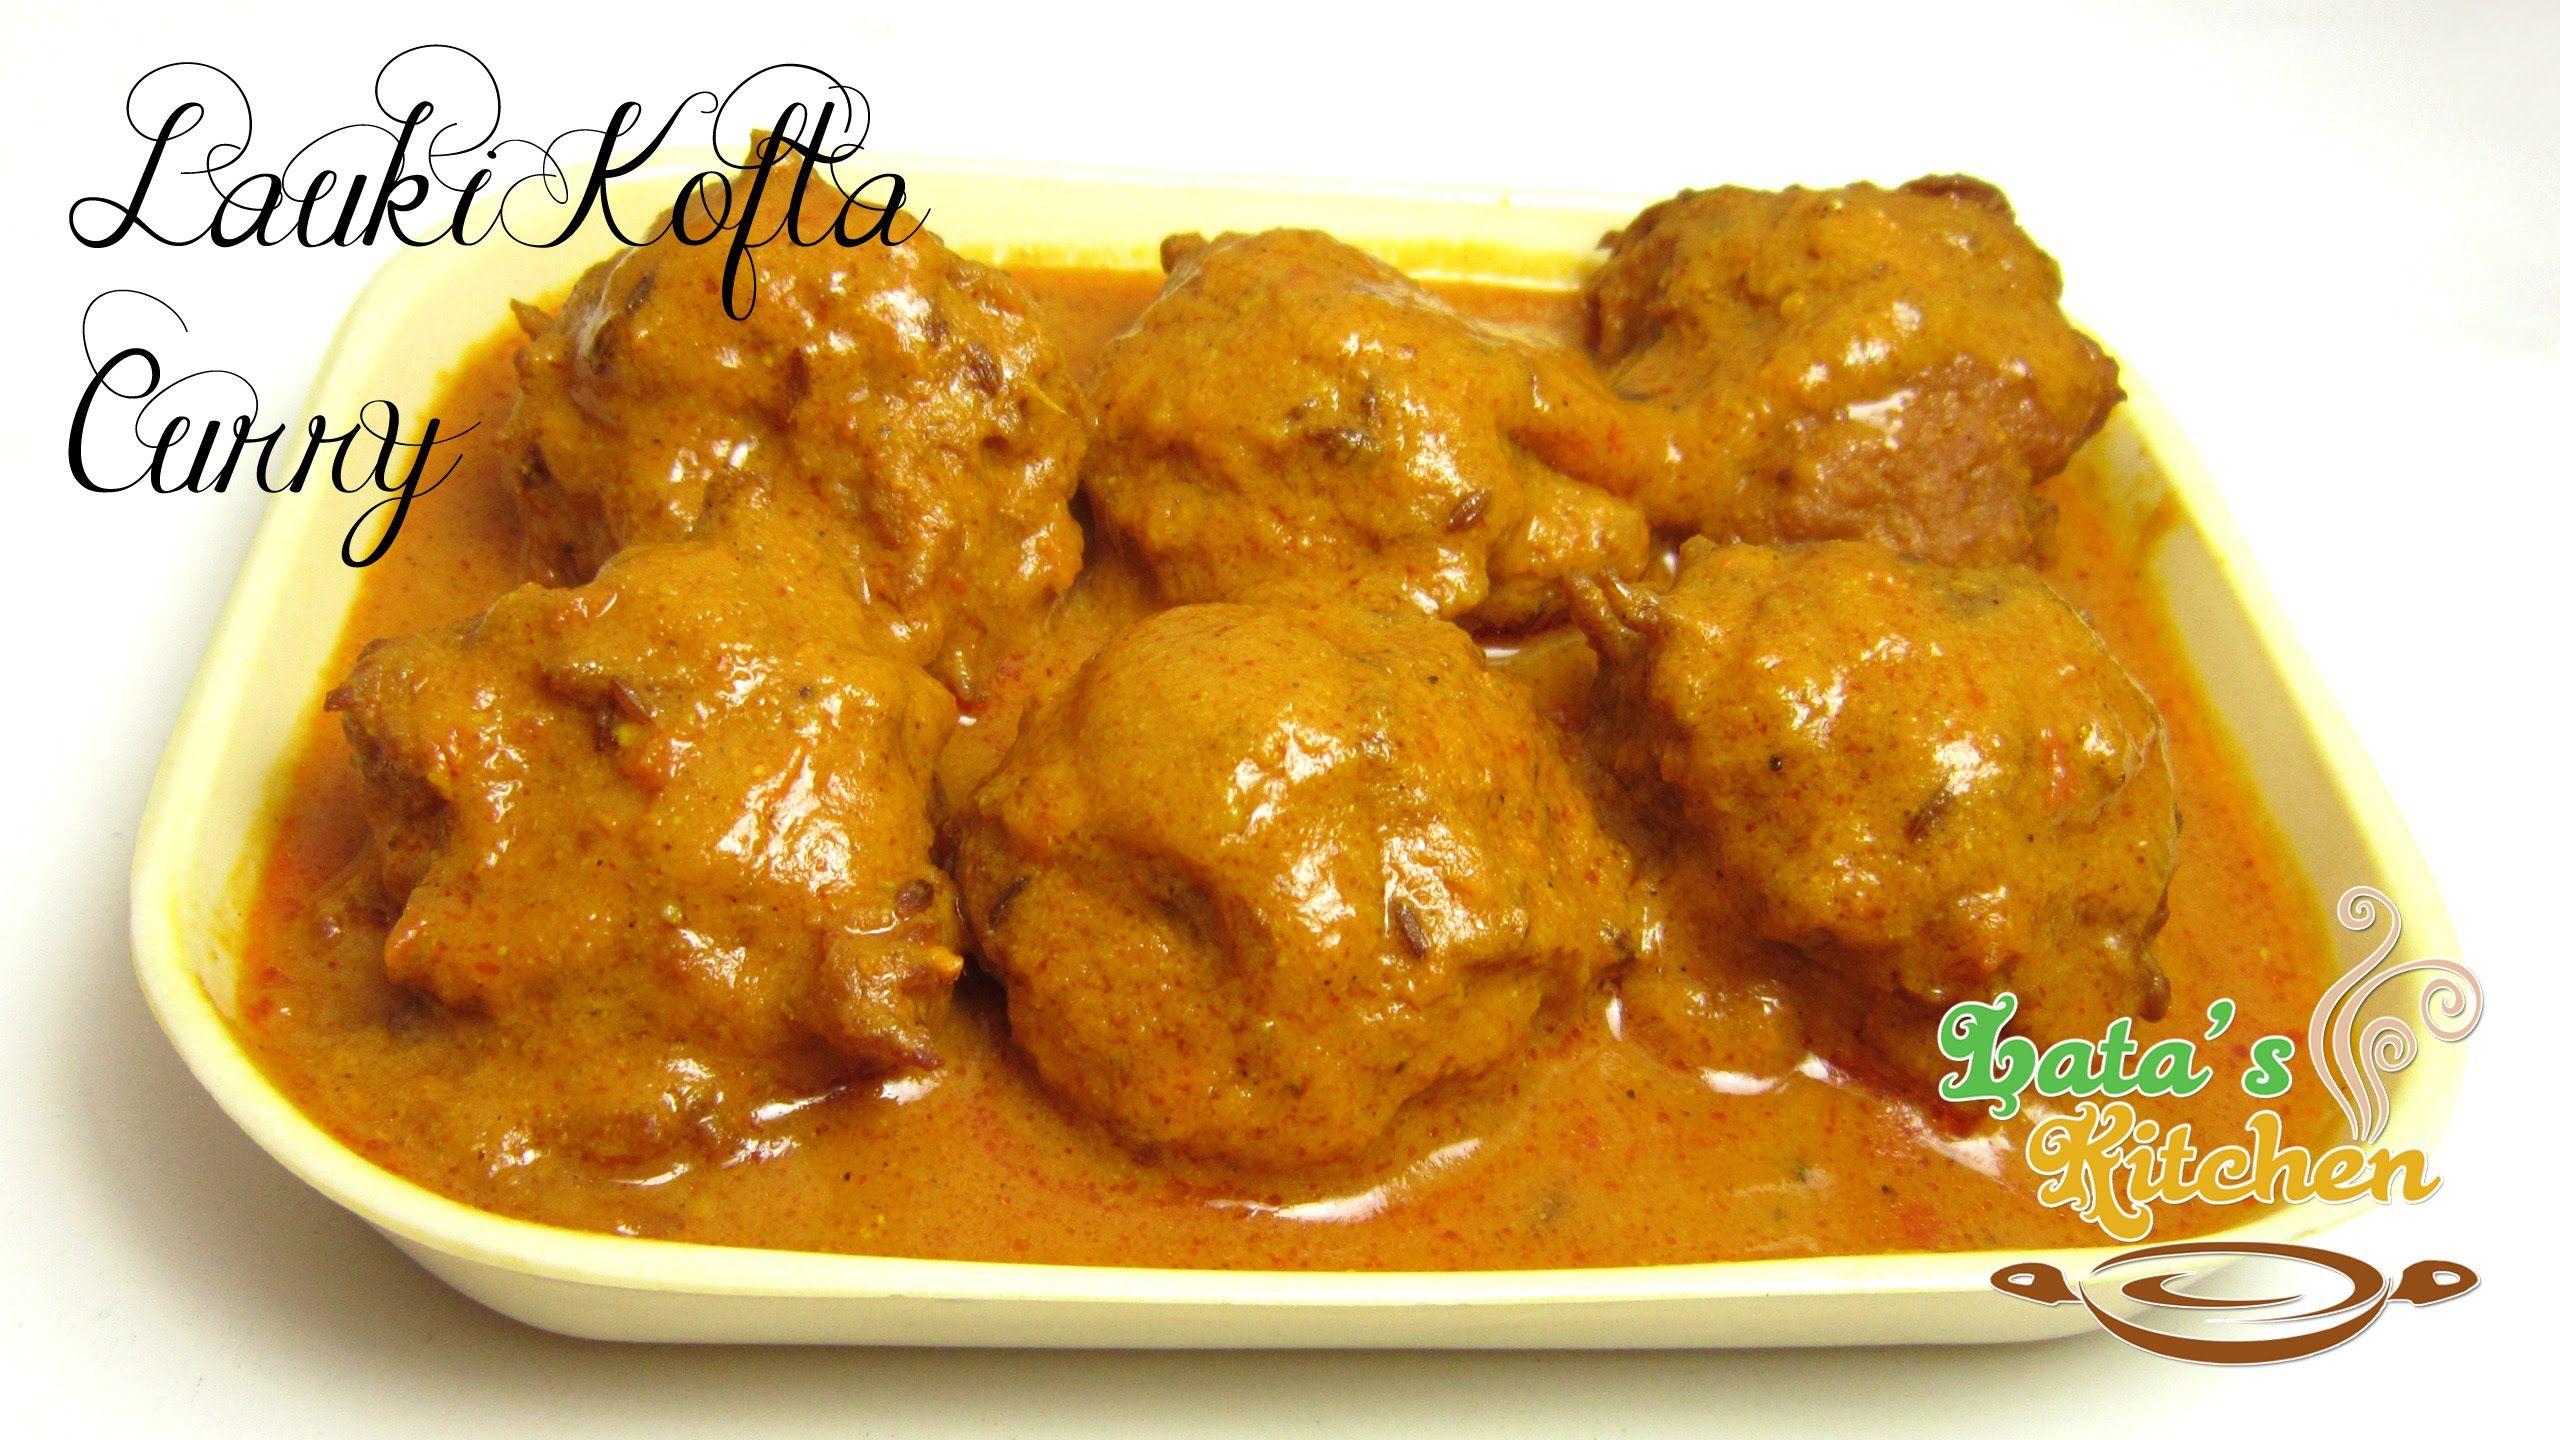 Lauki kofta curry recipe indian vegetarian recipe in hindi with lauki kofta curry recipe indian vegetarian recipe in hindi with english subtitles forumfinder Gallery